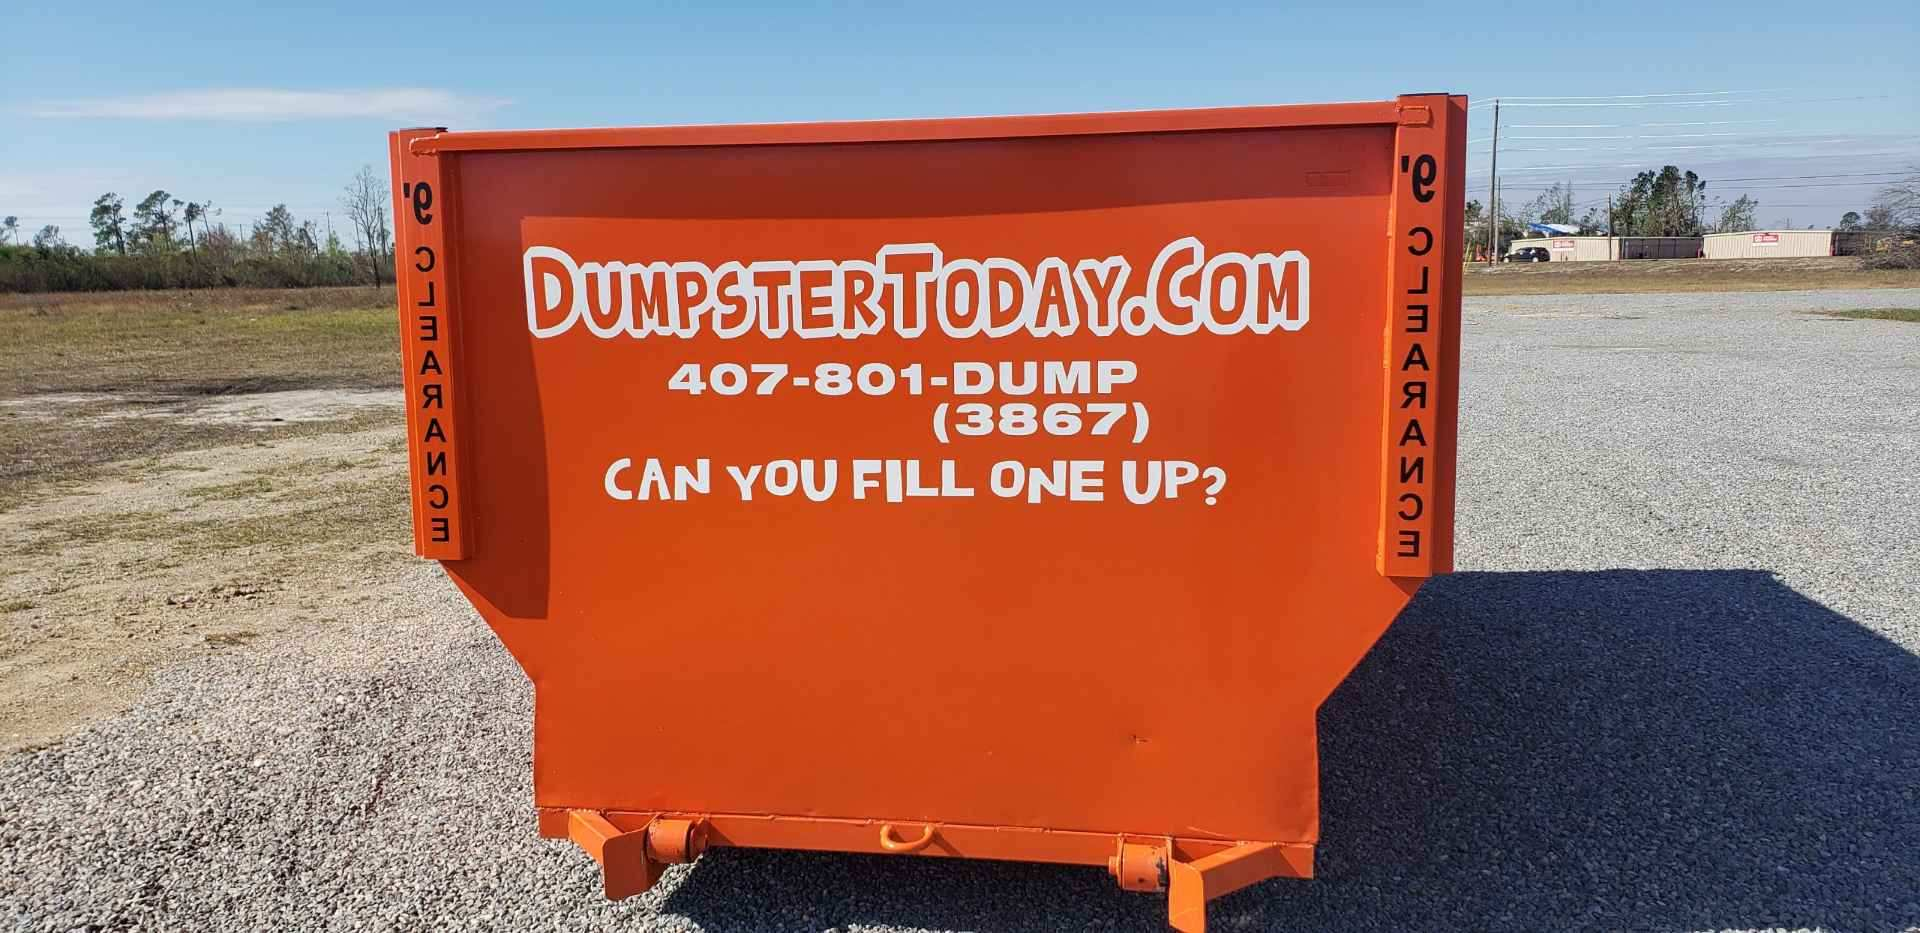 Dumpster Today Easy Dumpster Rental Orlando